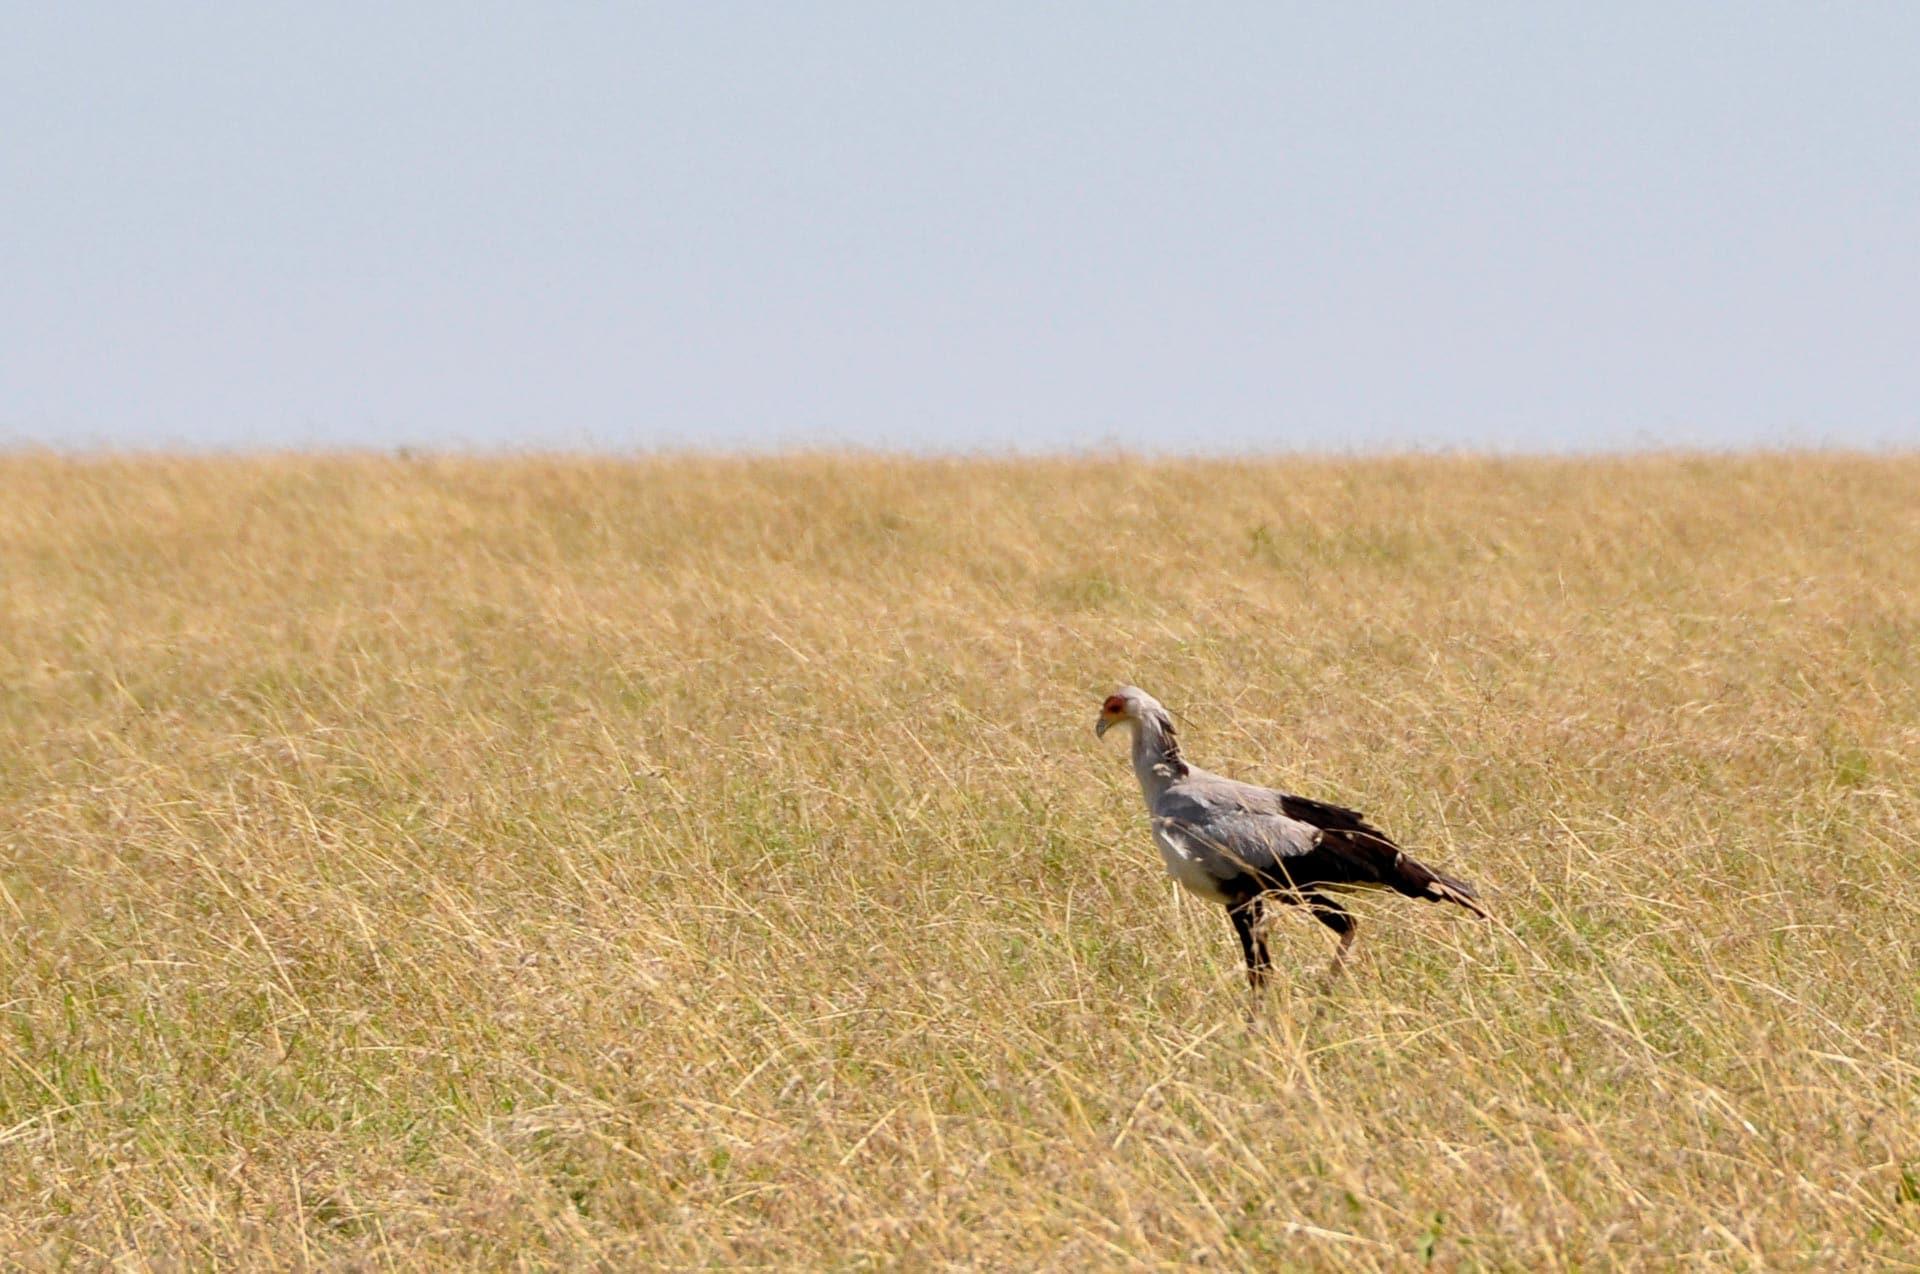 Masai-Mara-Kenia-Globetrotter-Select-10